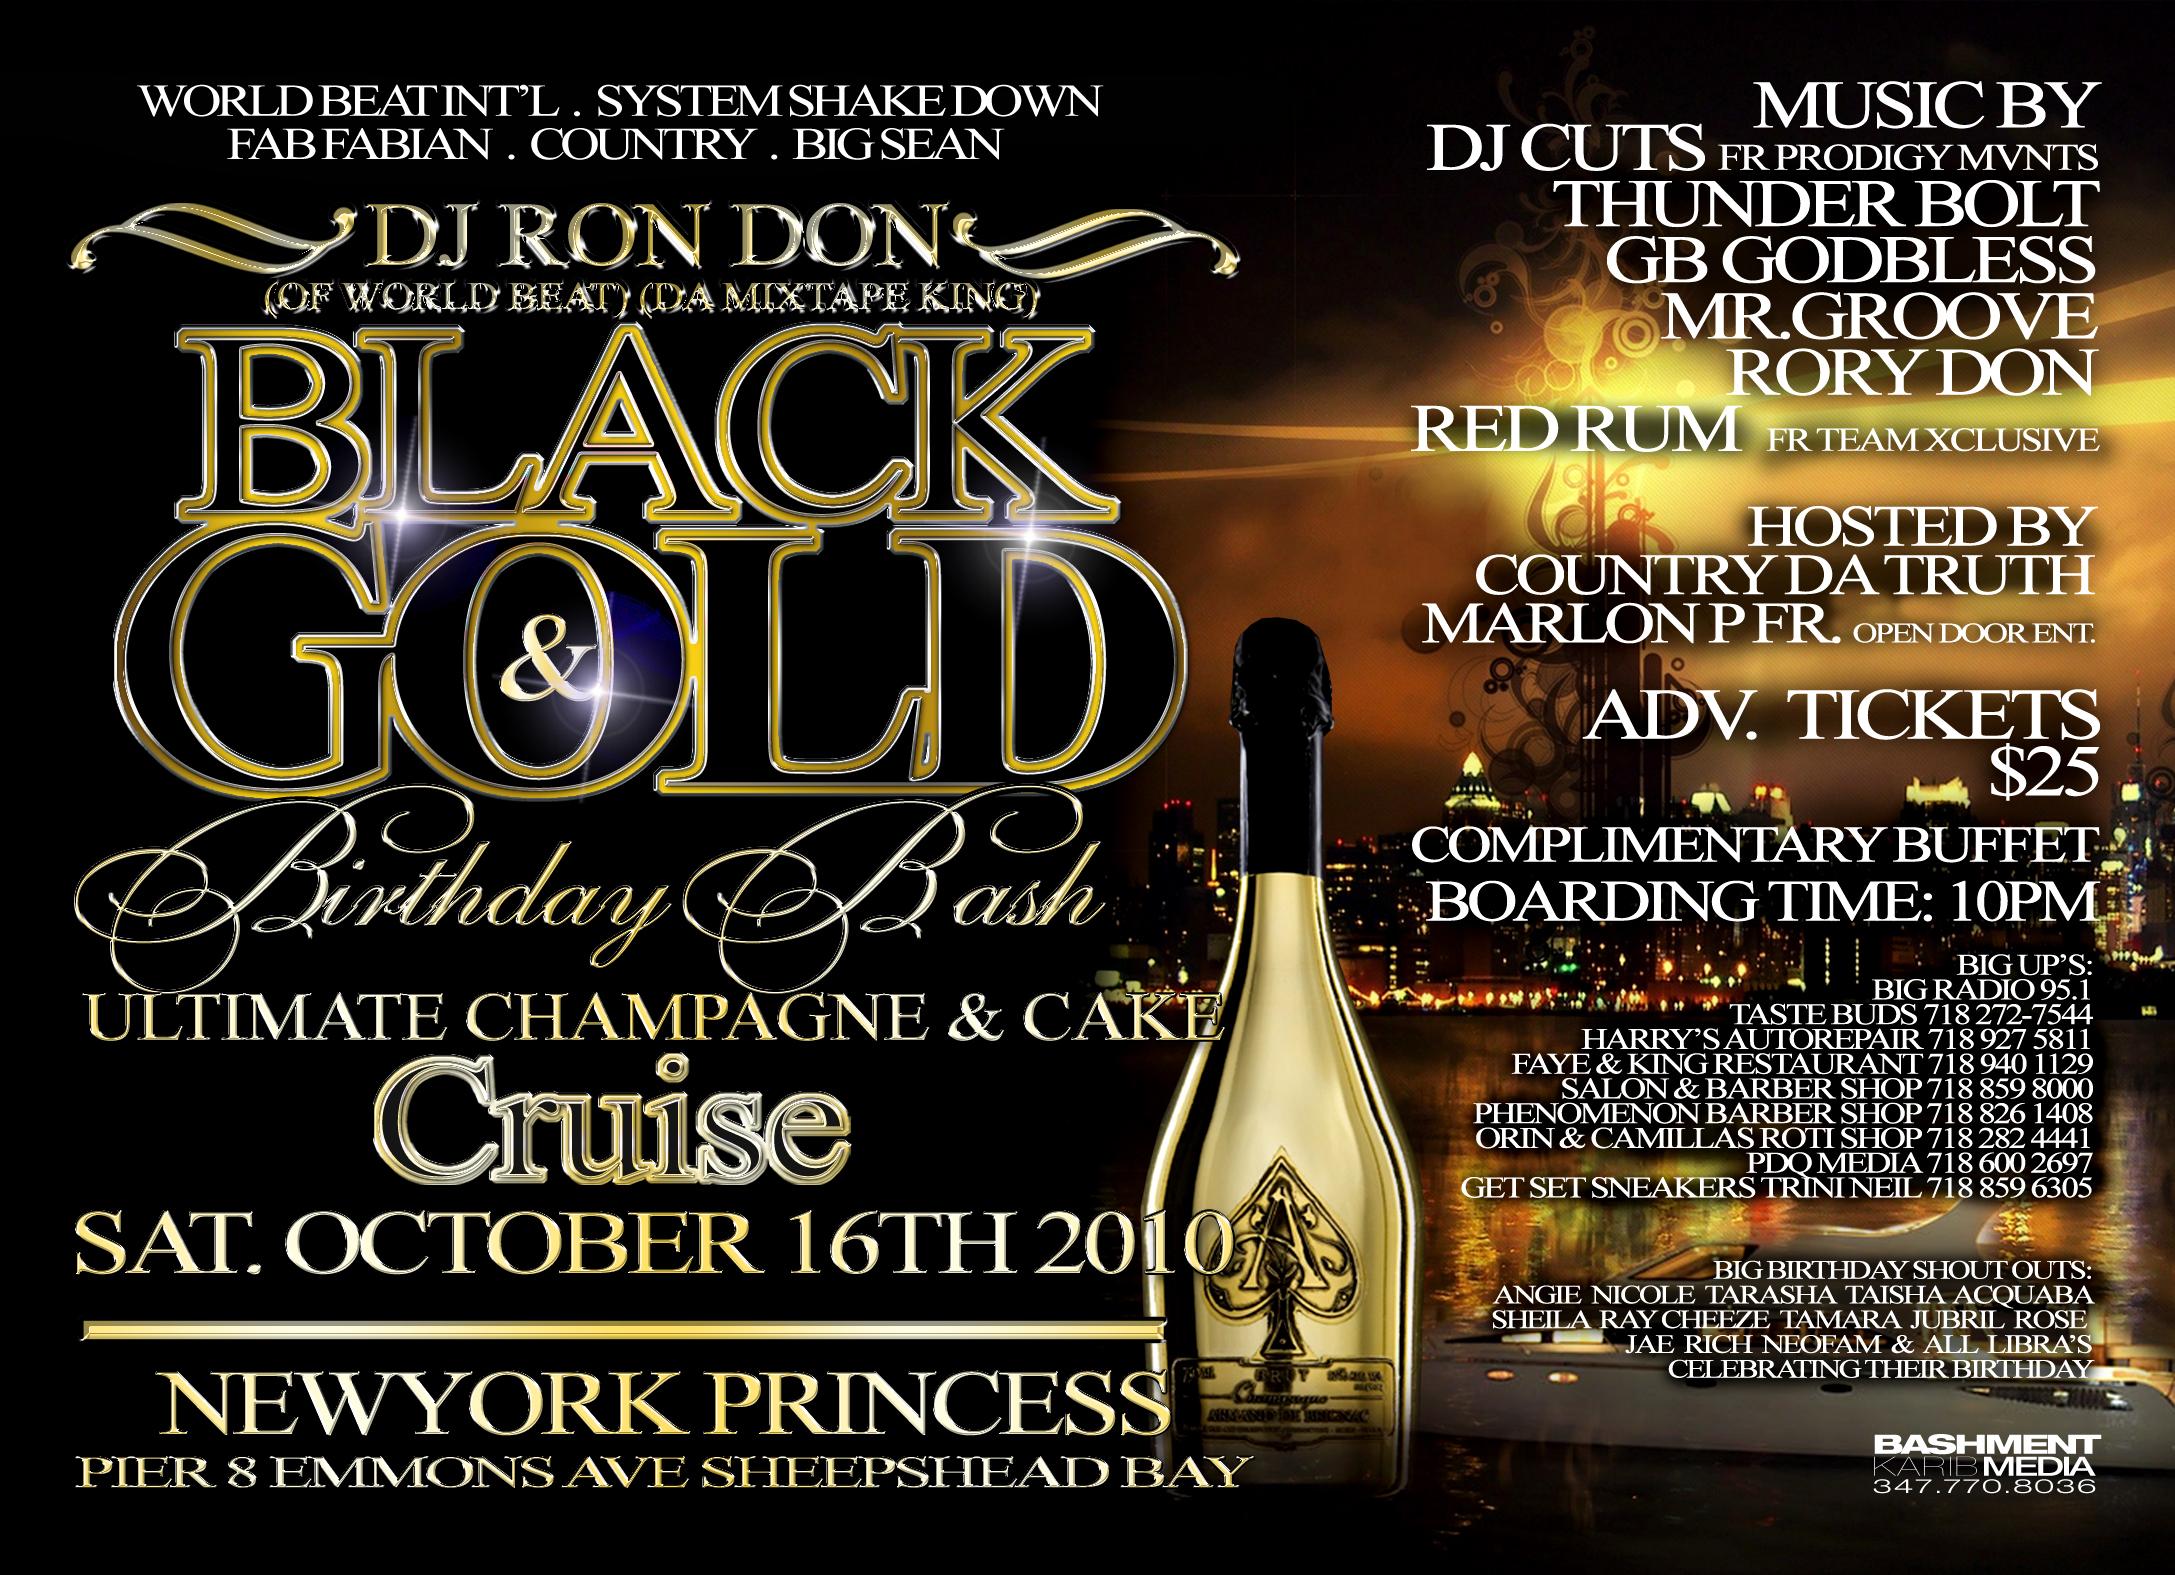 DJ RON DON BLACK & GOLD 2K10 DANCEHALL MIX CD (DWLN ONLY)